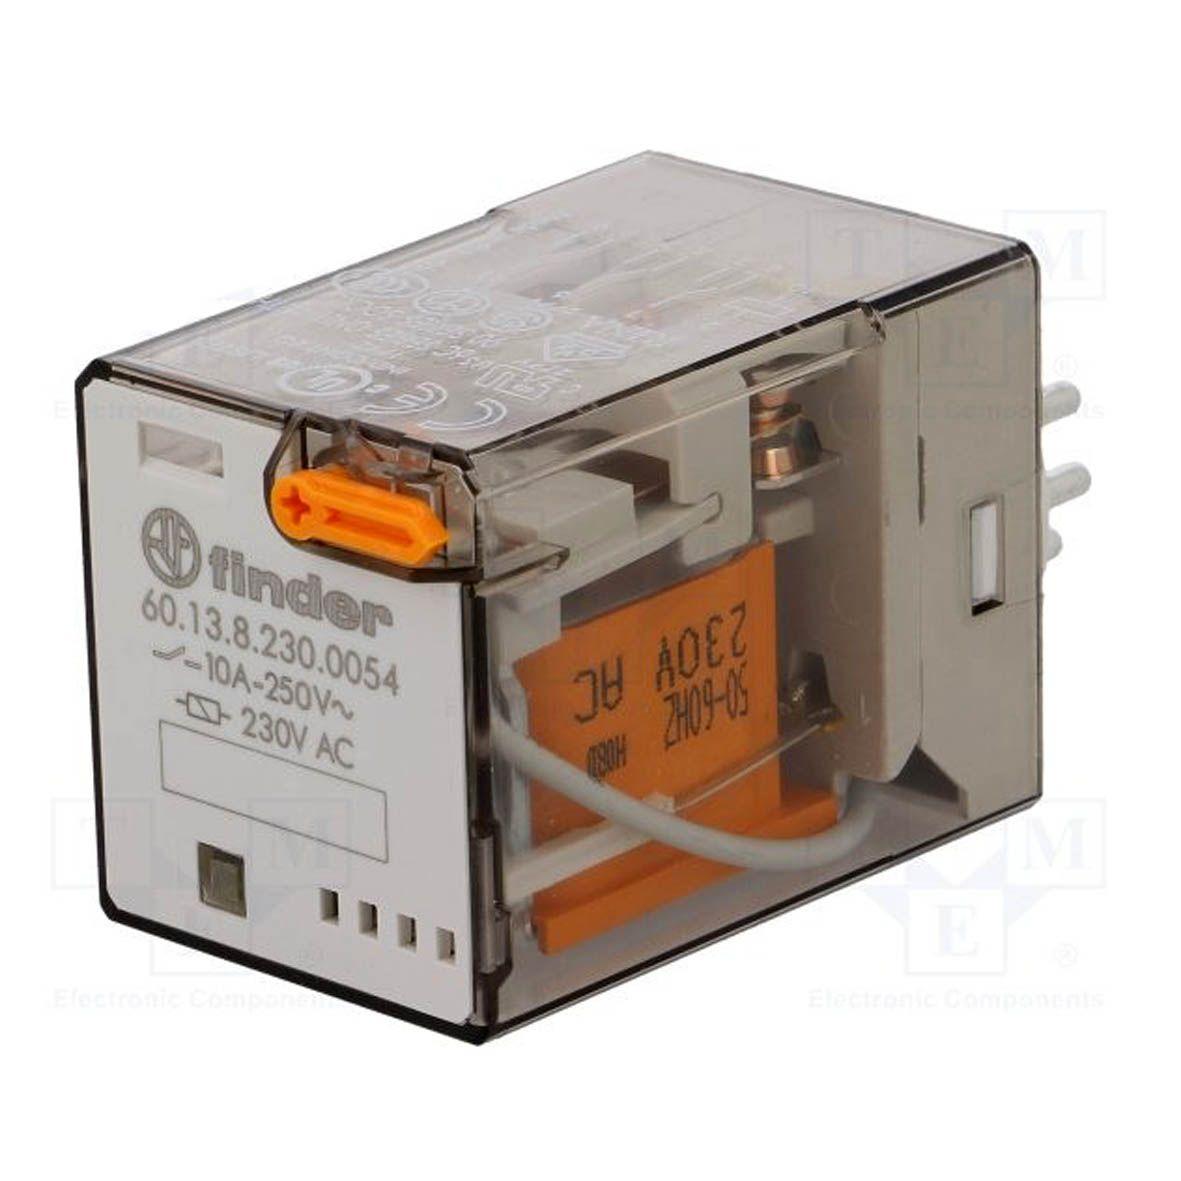 finder relay 8 pin diagram finder 220vac relay 60 12  8 pin   finder 220vac relay 60 12  8 pin